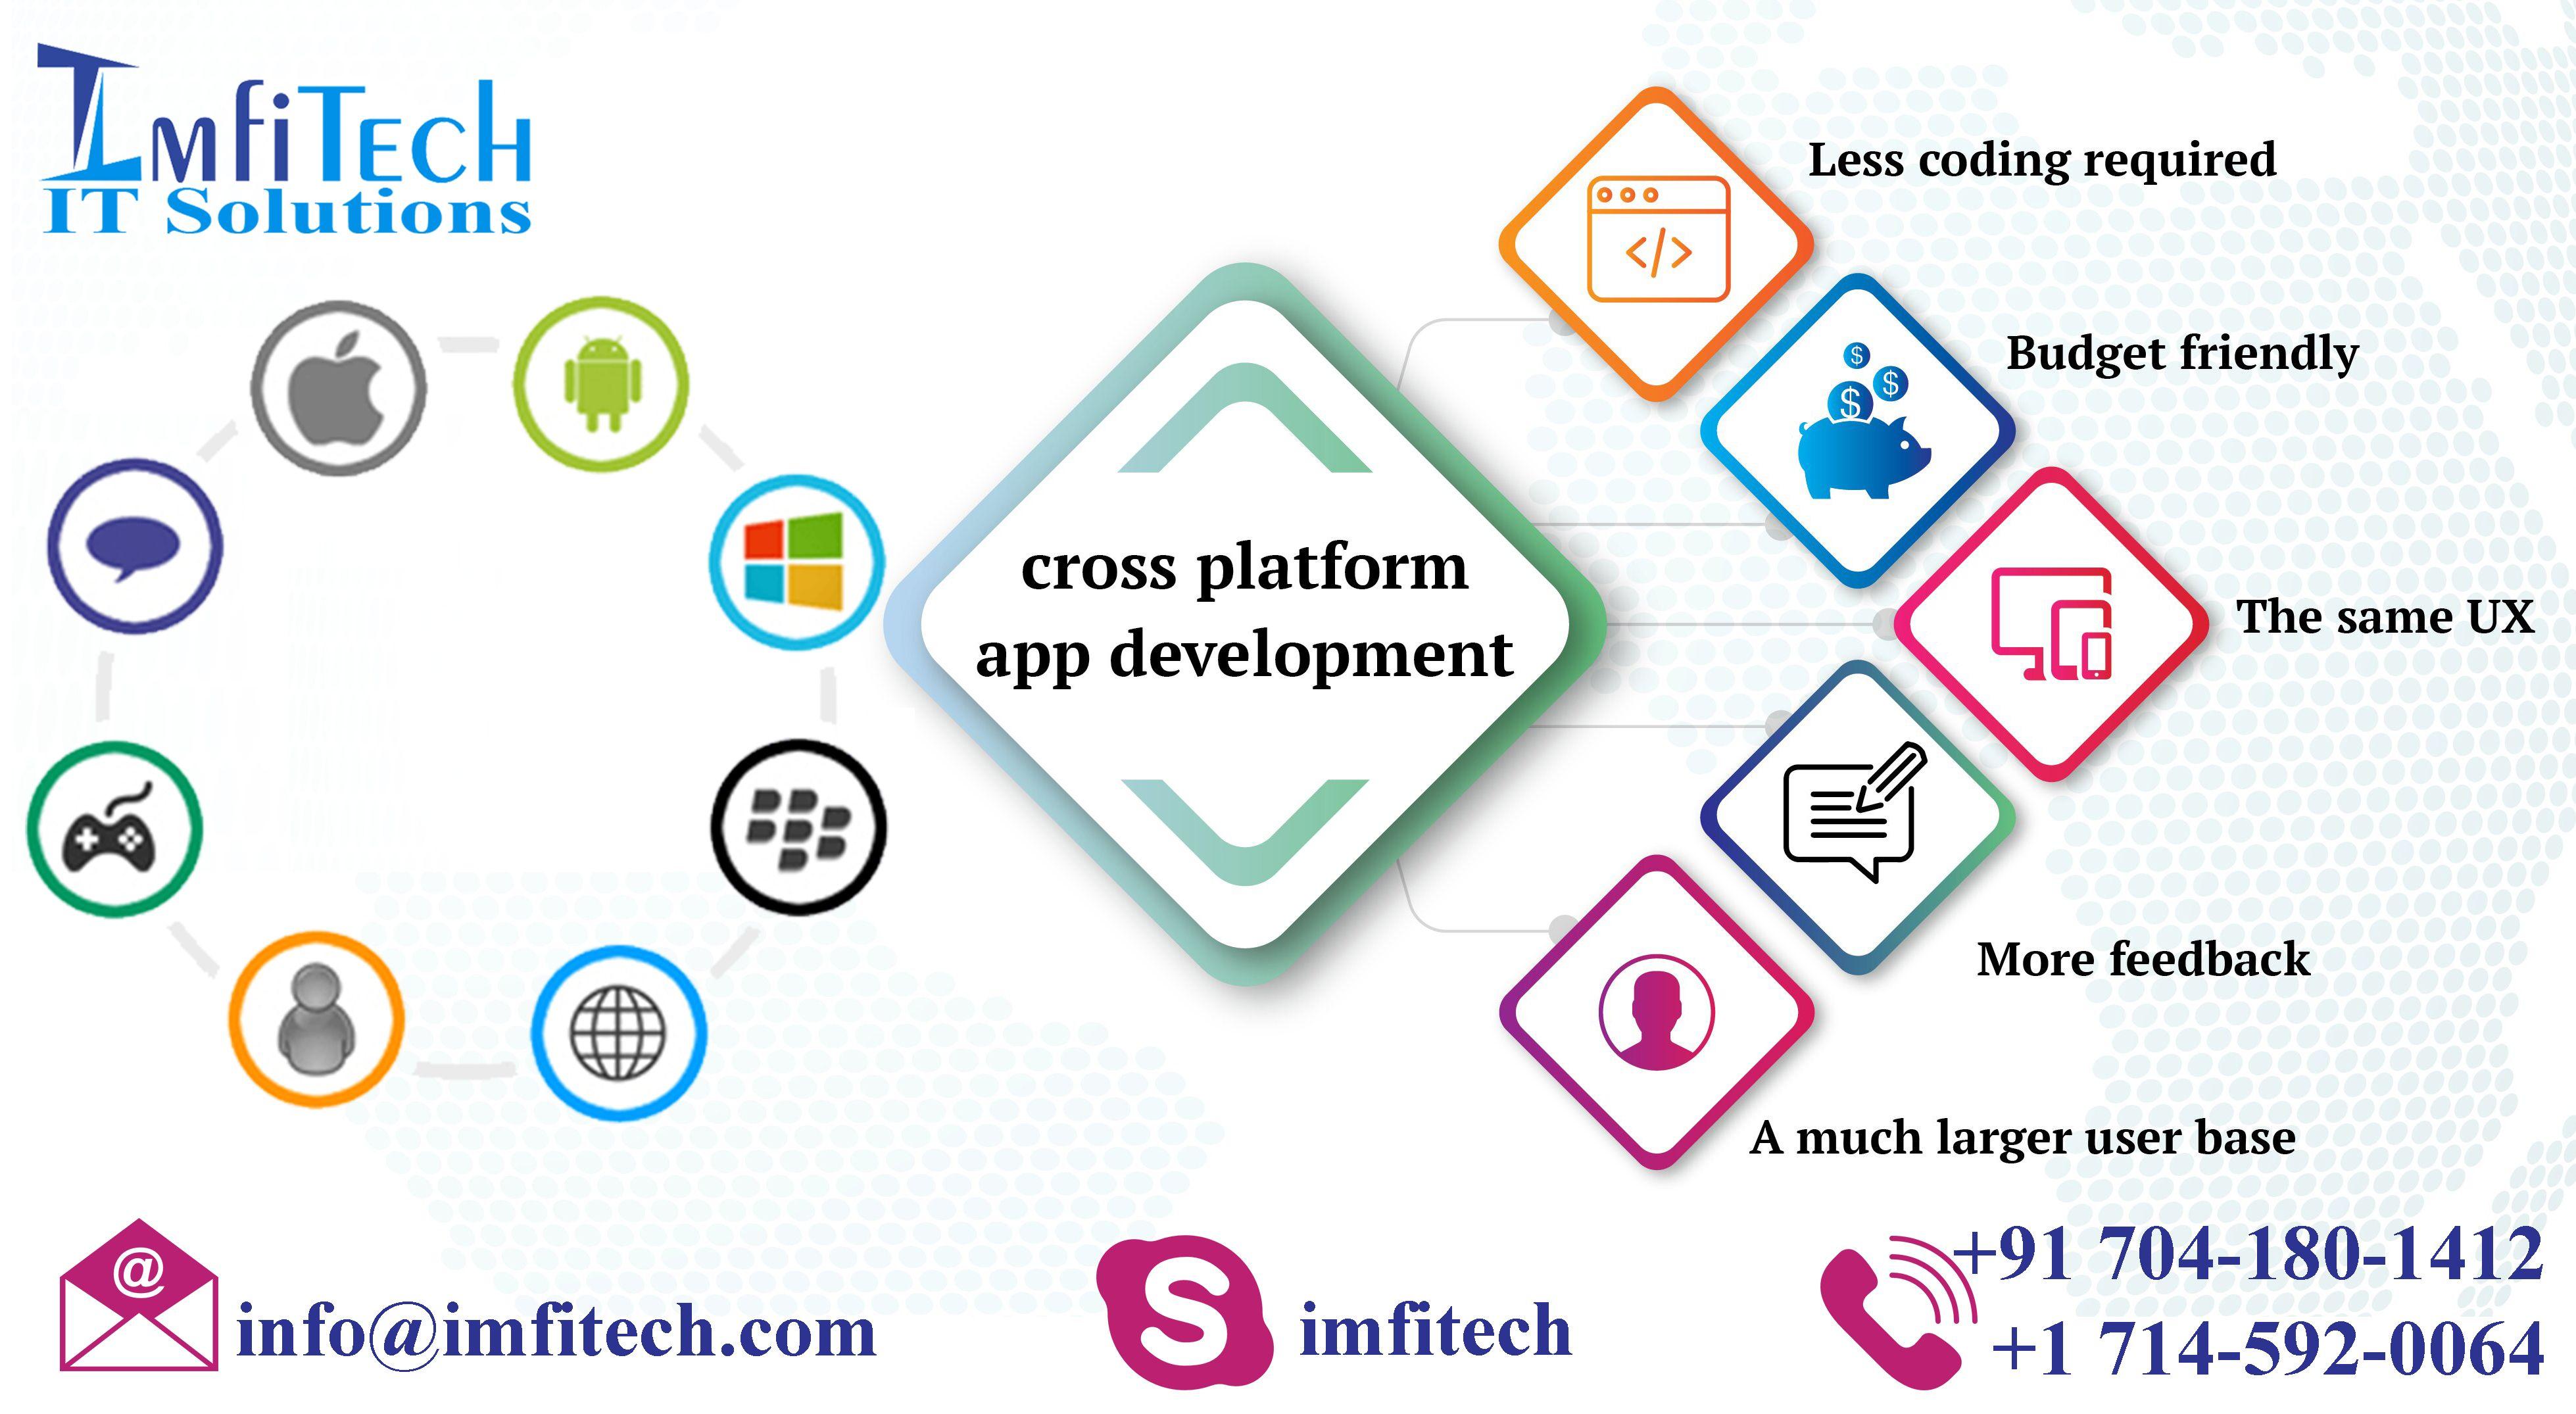 Imfitech is a provider of MultiPlatform application